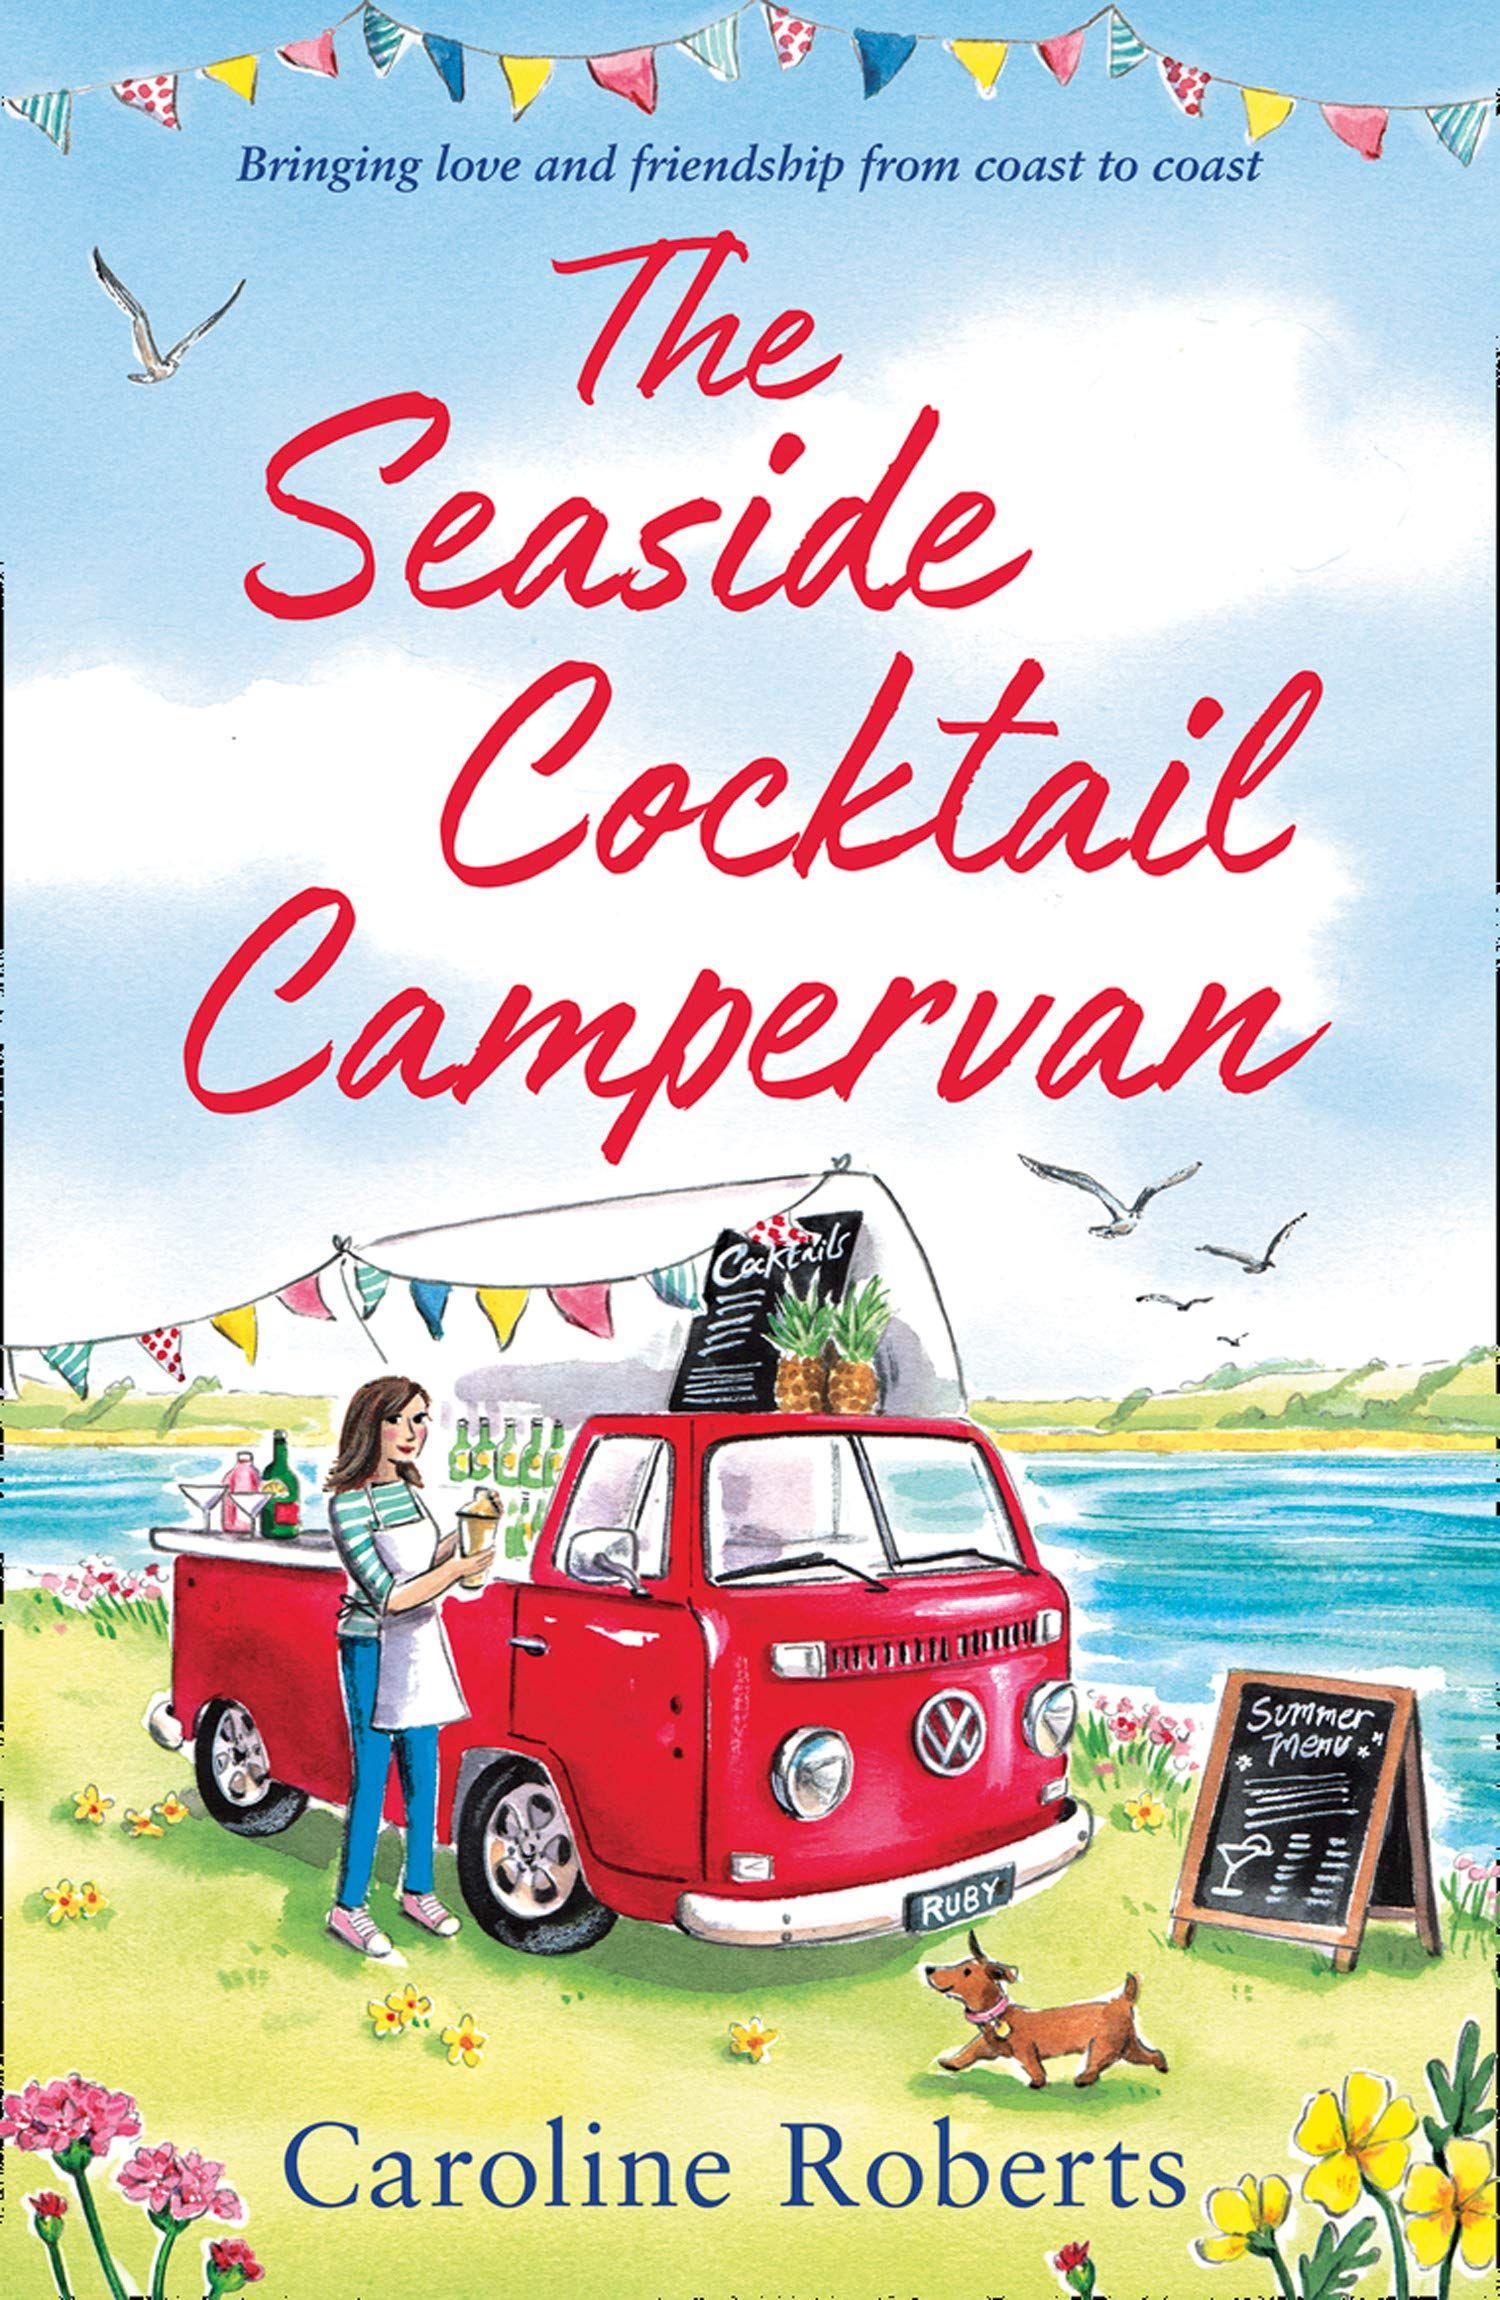 The Seaside Cocktail Campervan